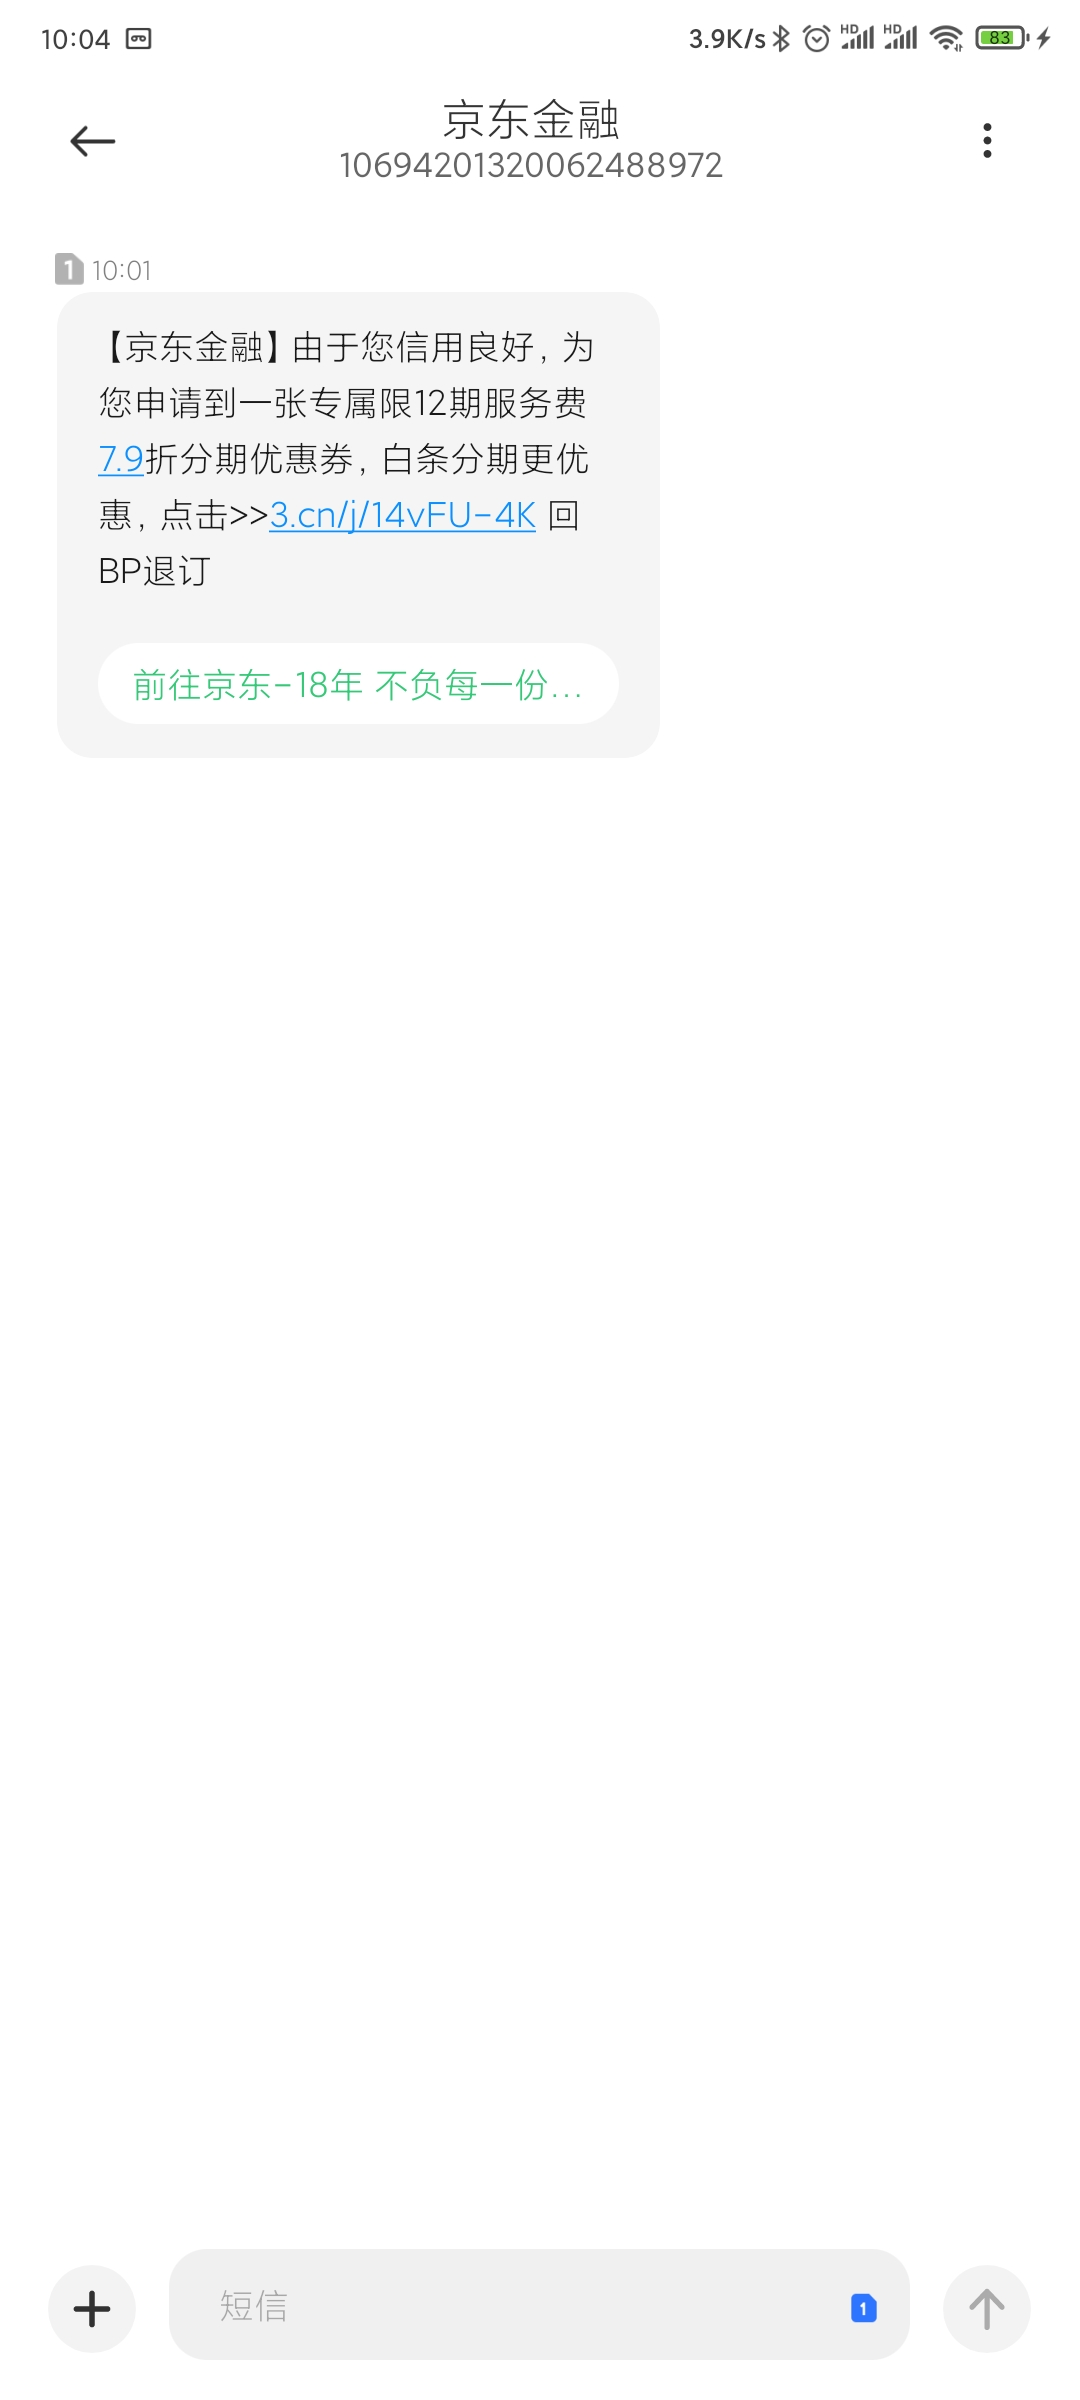 Screenshot_2021-05-26-10-04-53-578_com.android.mms.jpg